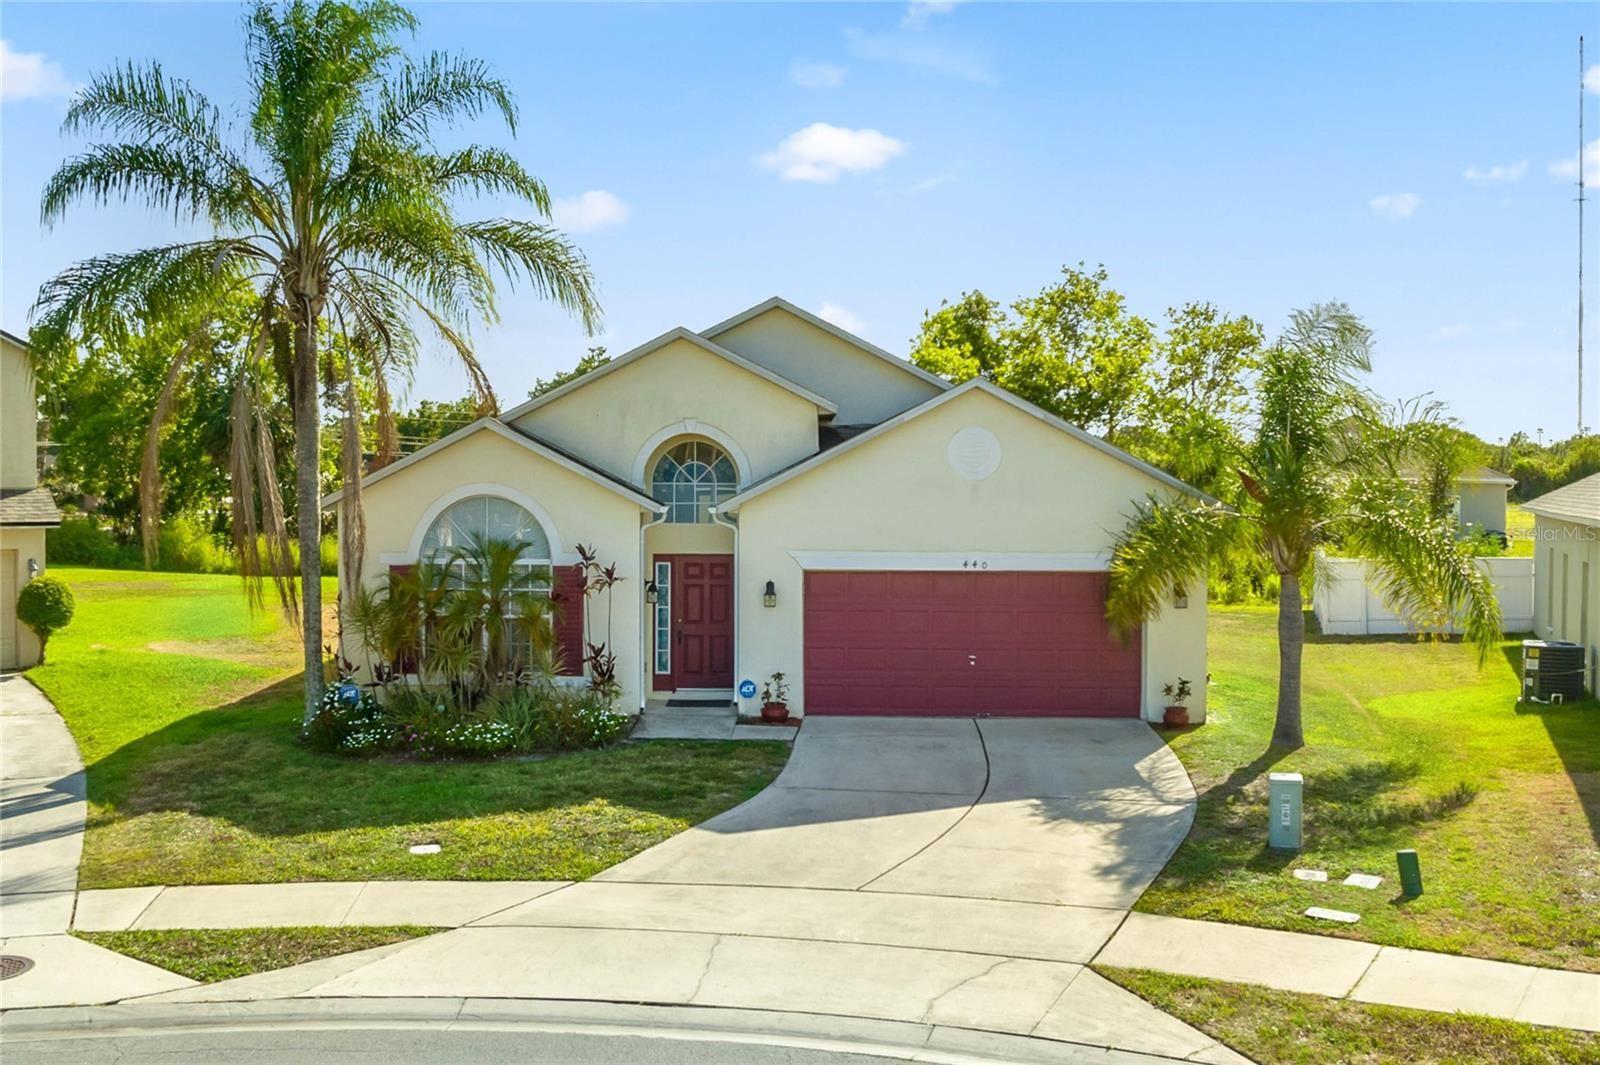 440 CASA MARINA PLACE, Sanford, FL 32771 - #: S5051762